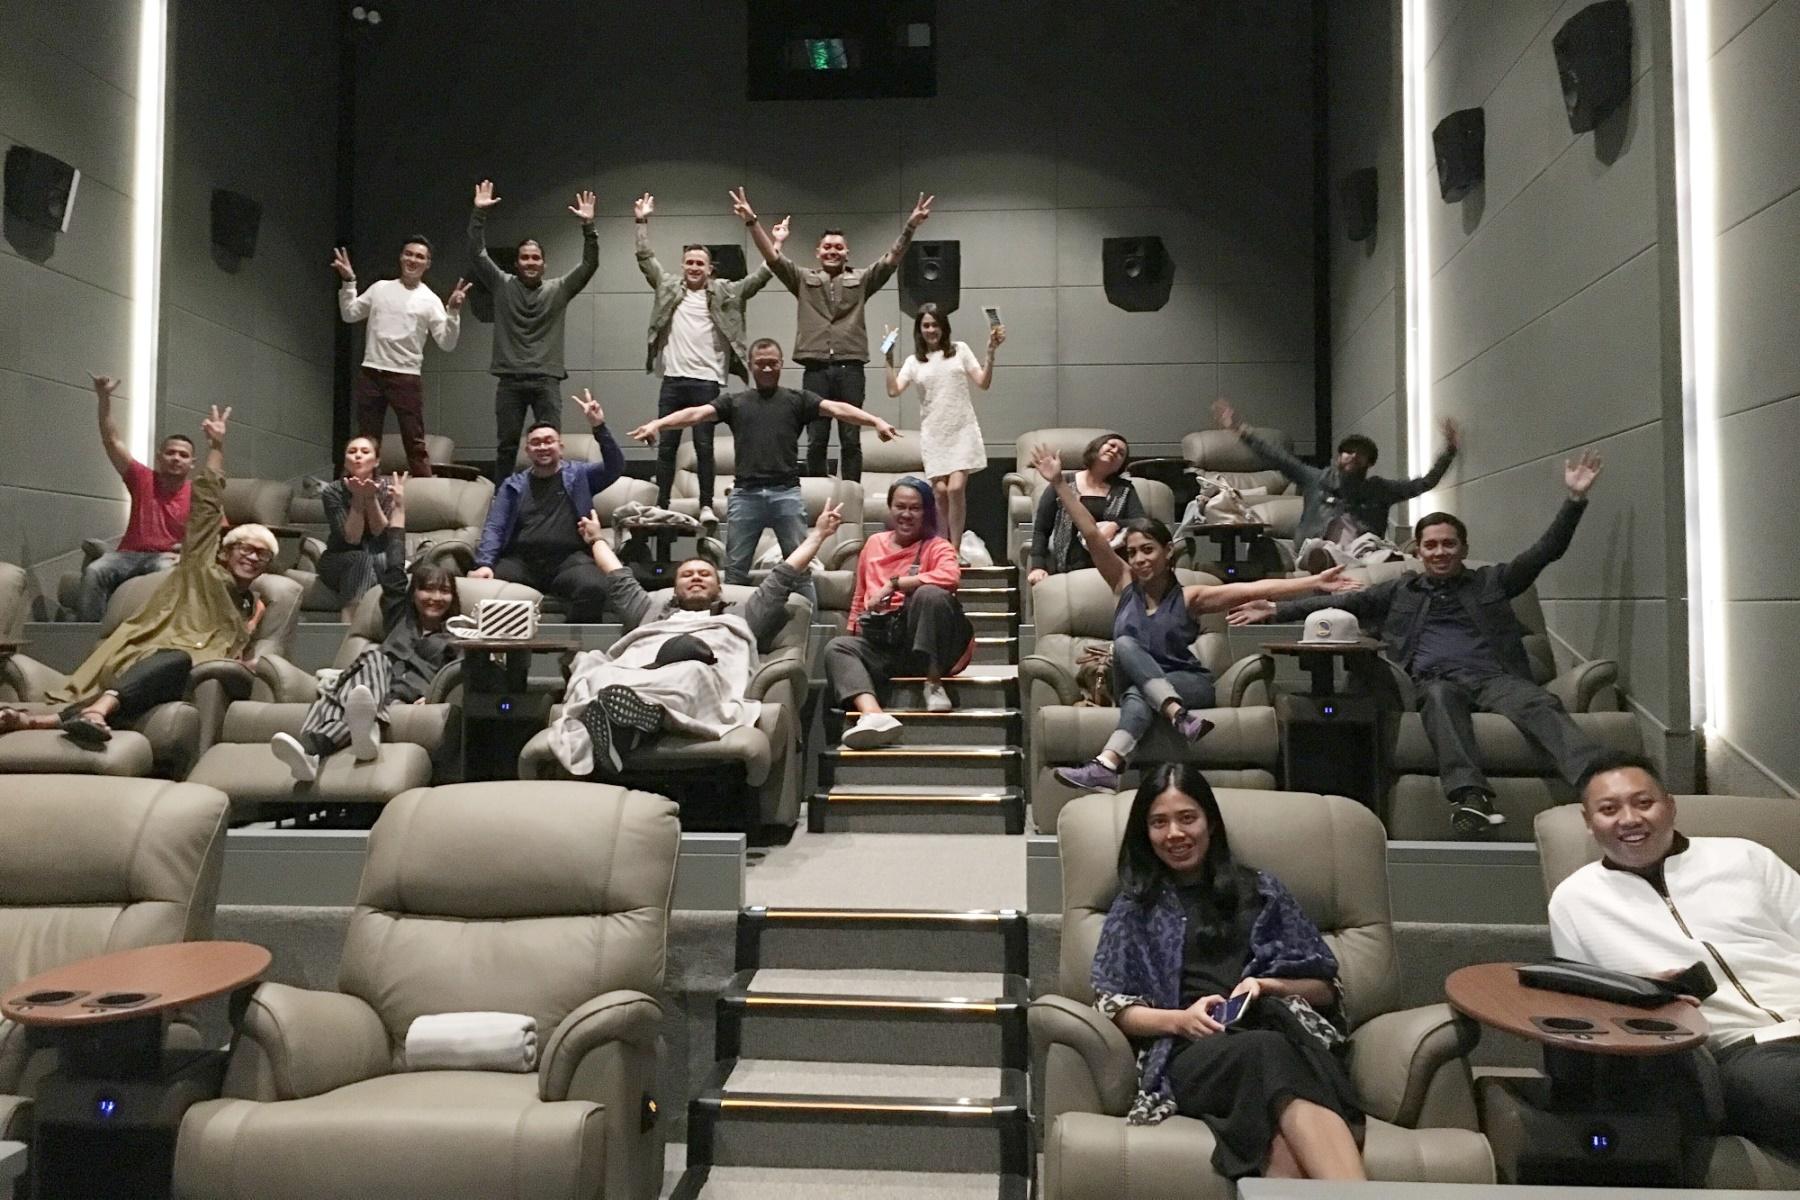 Alcons Pro Ribbons Deliver Flix Cinema S Platinum Quality